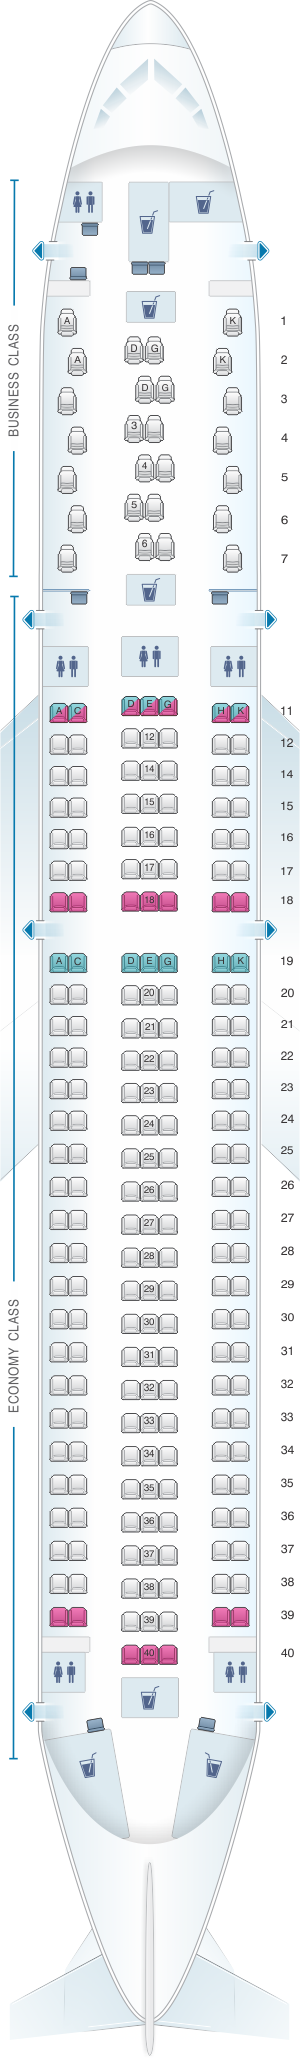 how to choose flight seats